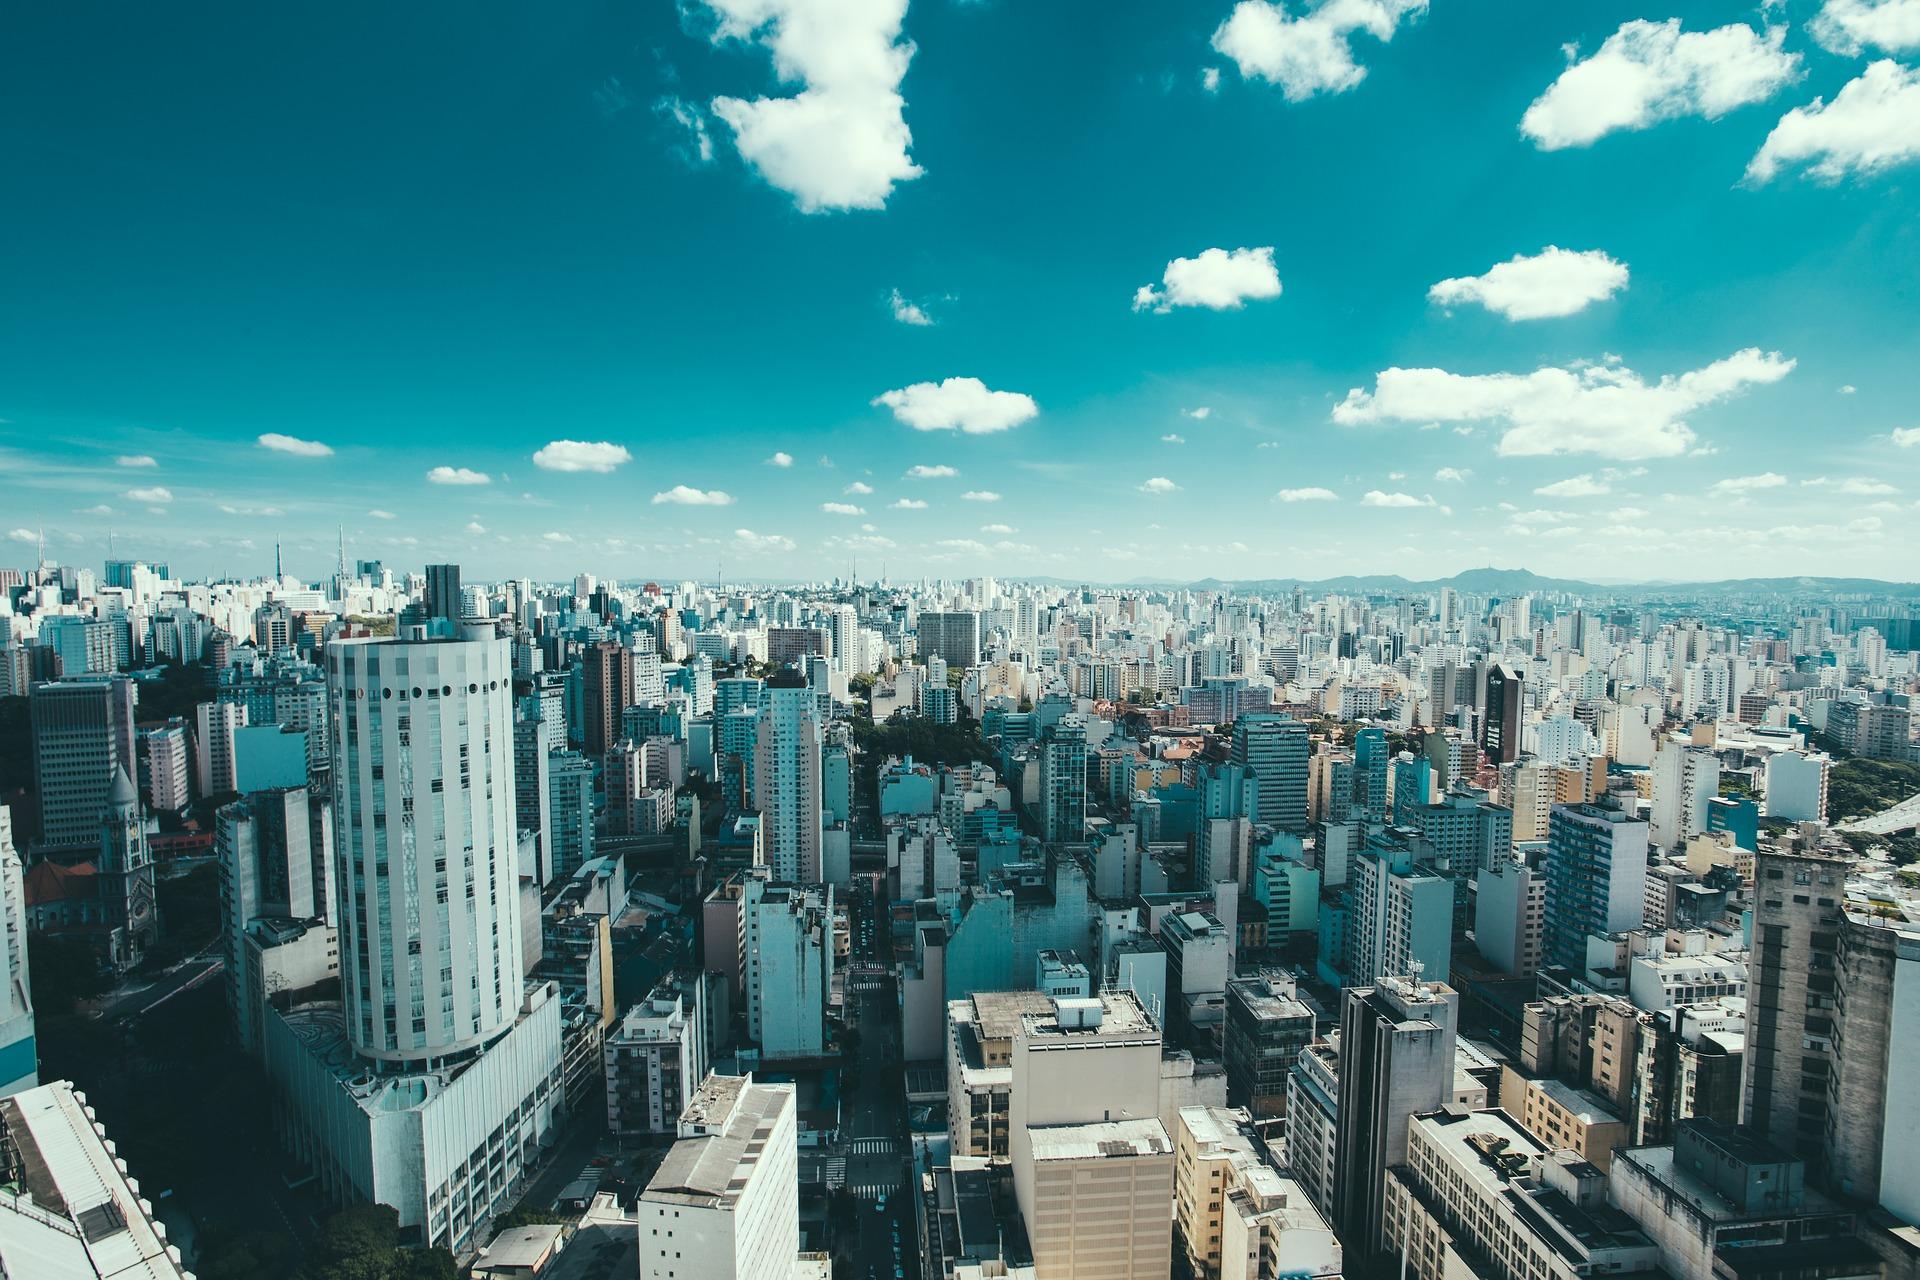 Santander leiloa 85 imóveis em 13 regiões do Brasil